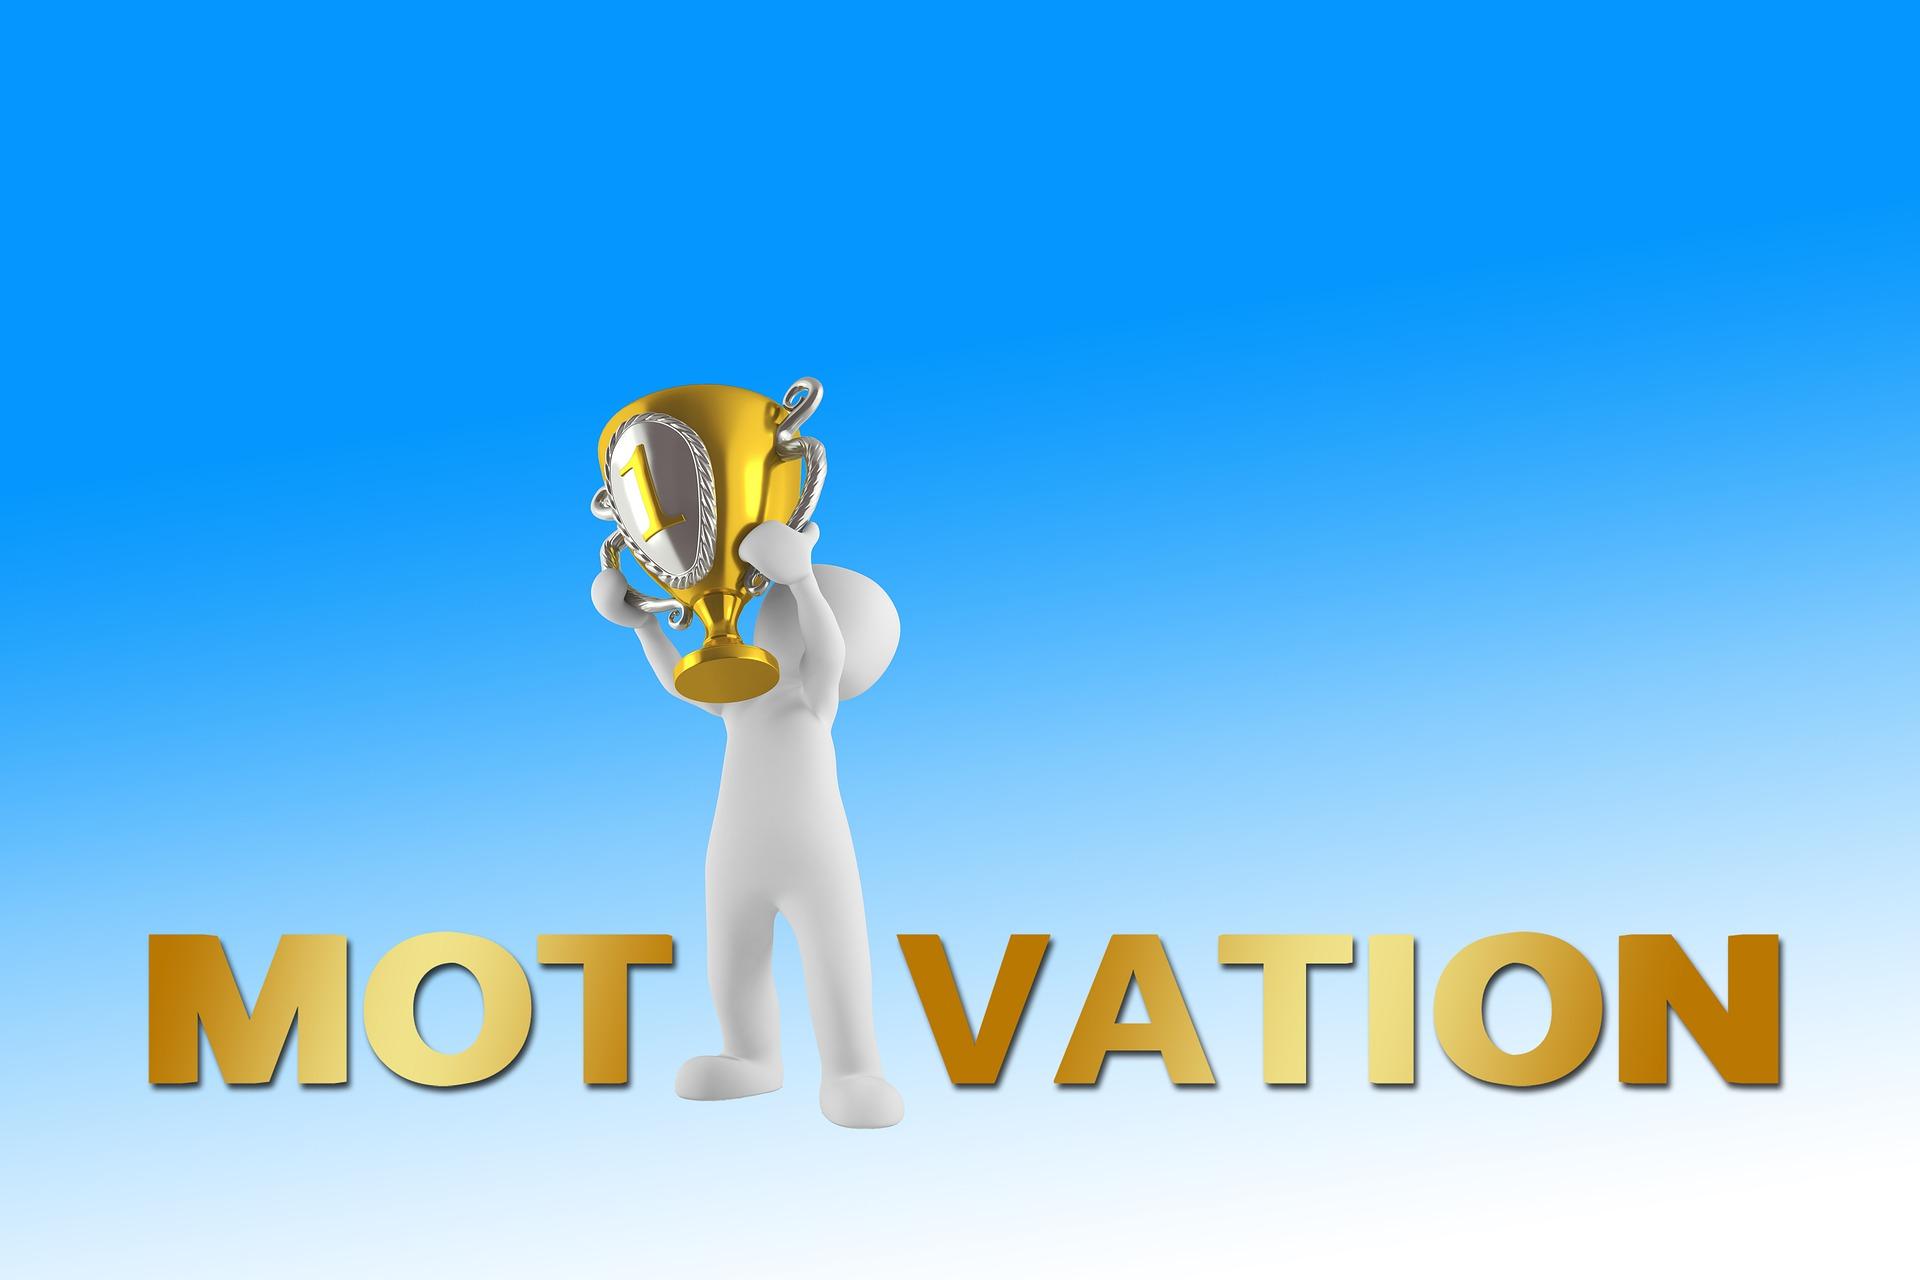 motivation-3131641_1920